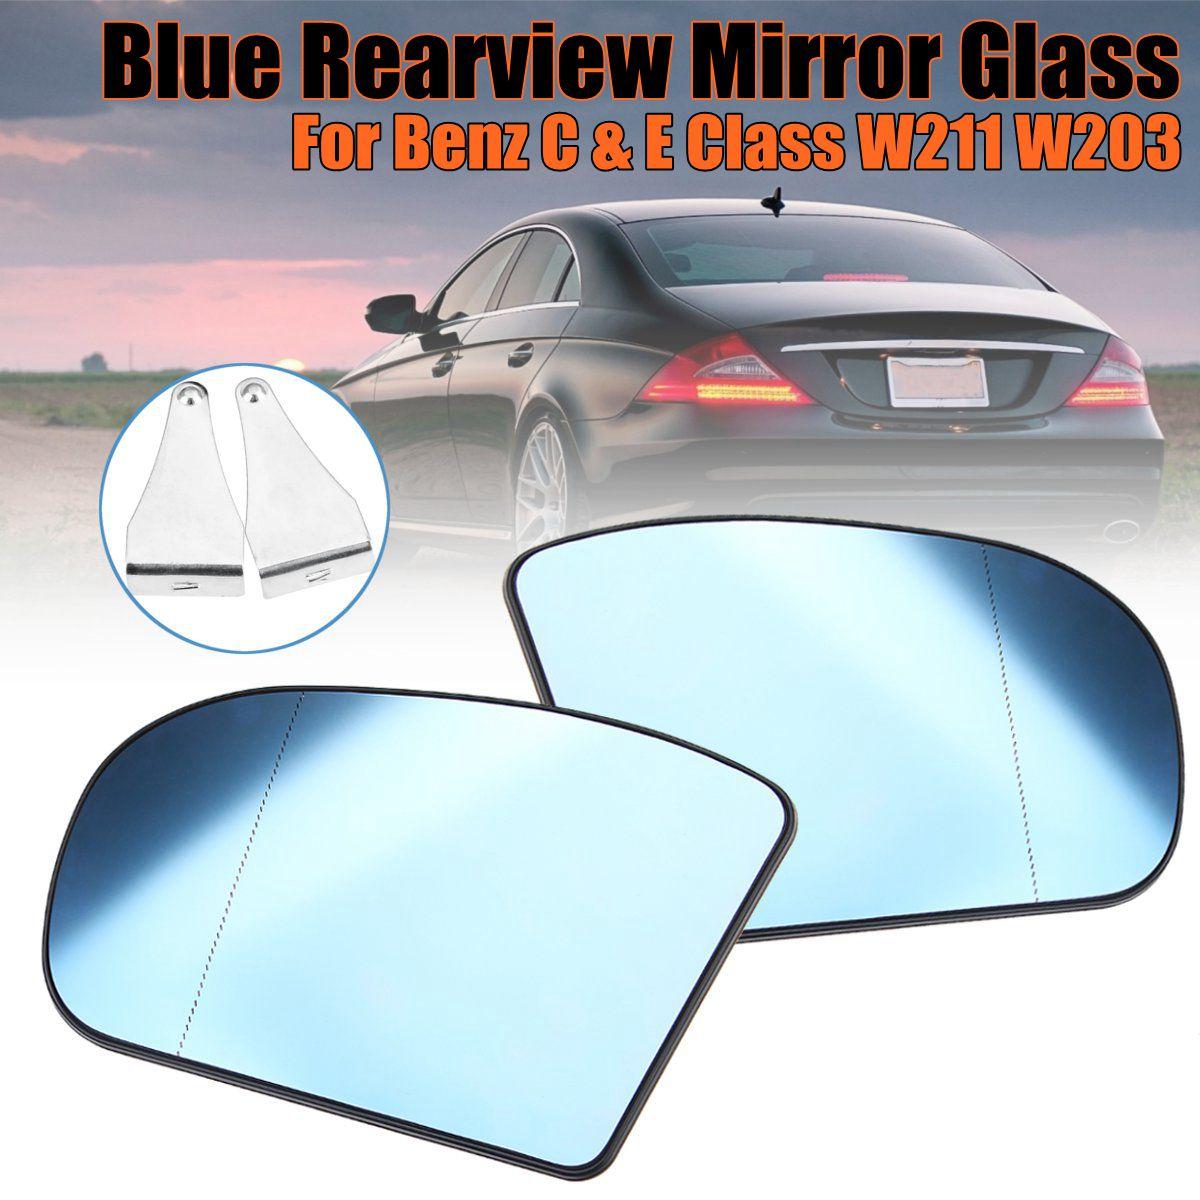 Coche de espejo retrovisor lateral de vidrio azul Anti-deslumbramiento espejo retrovisor térmico de vidrio para Mercedes Benz Clase C y E W211 W203